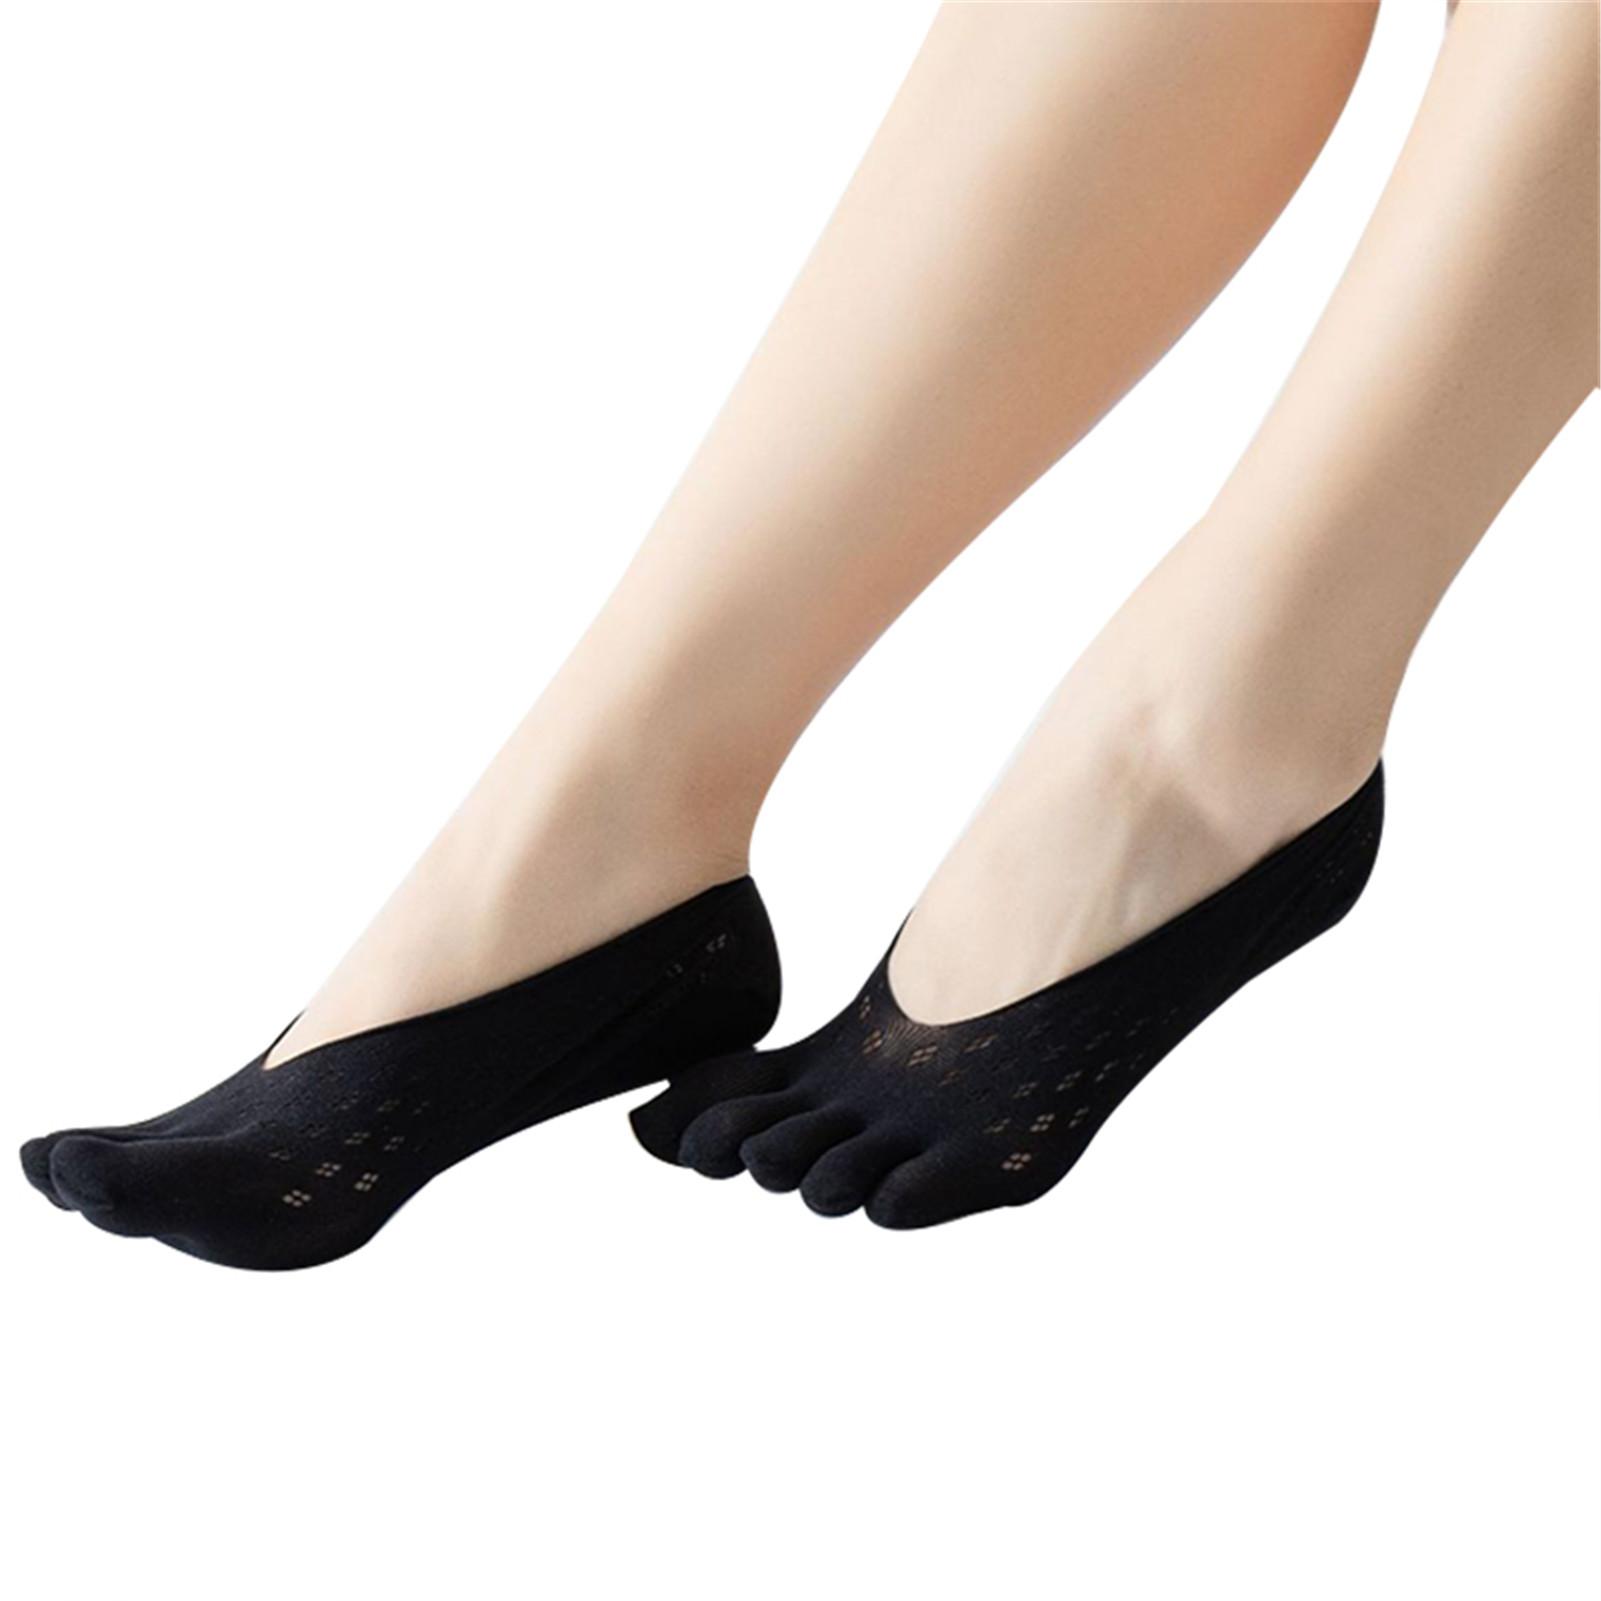 Orthopedic Compression Socks Women's Toe Socks Ultra Low Cut Liner with Gel Tab Breathable YS BUY